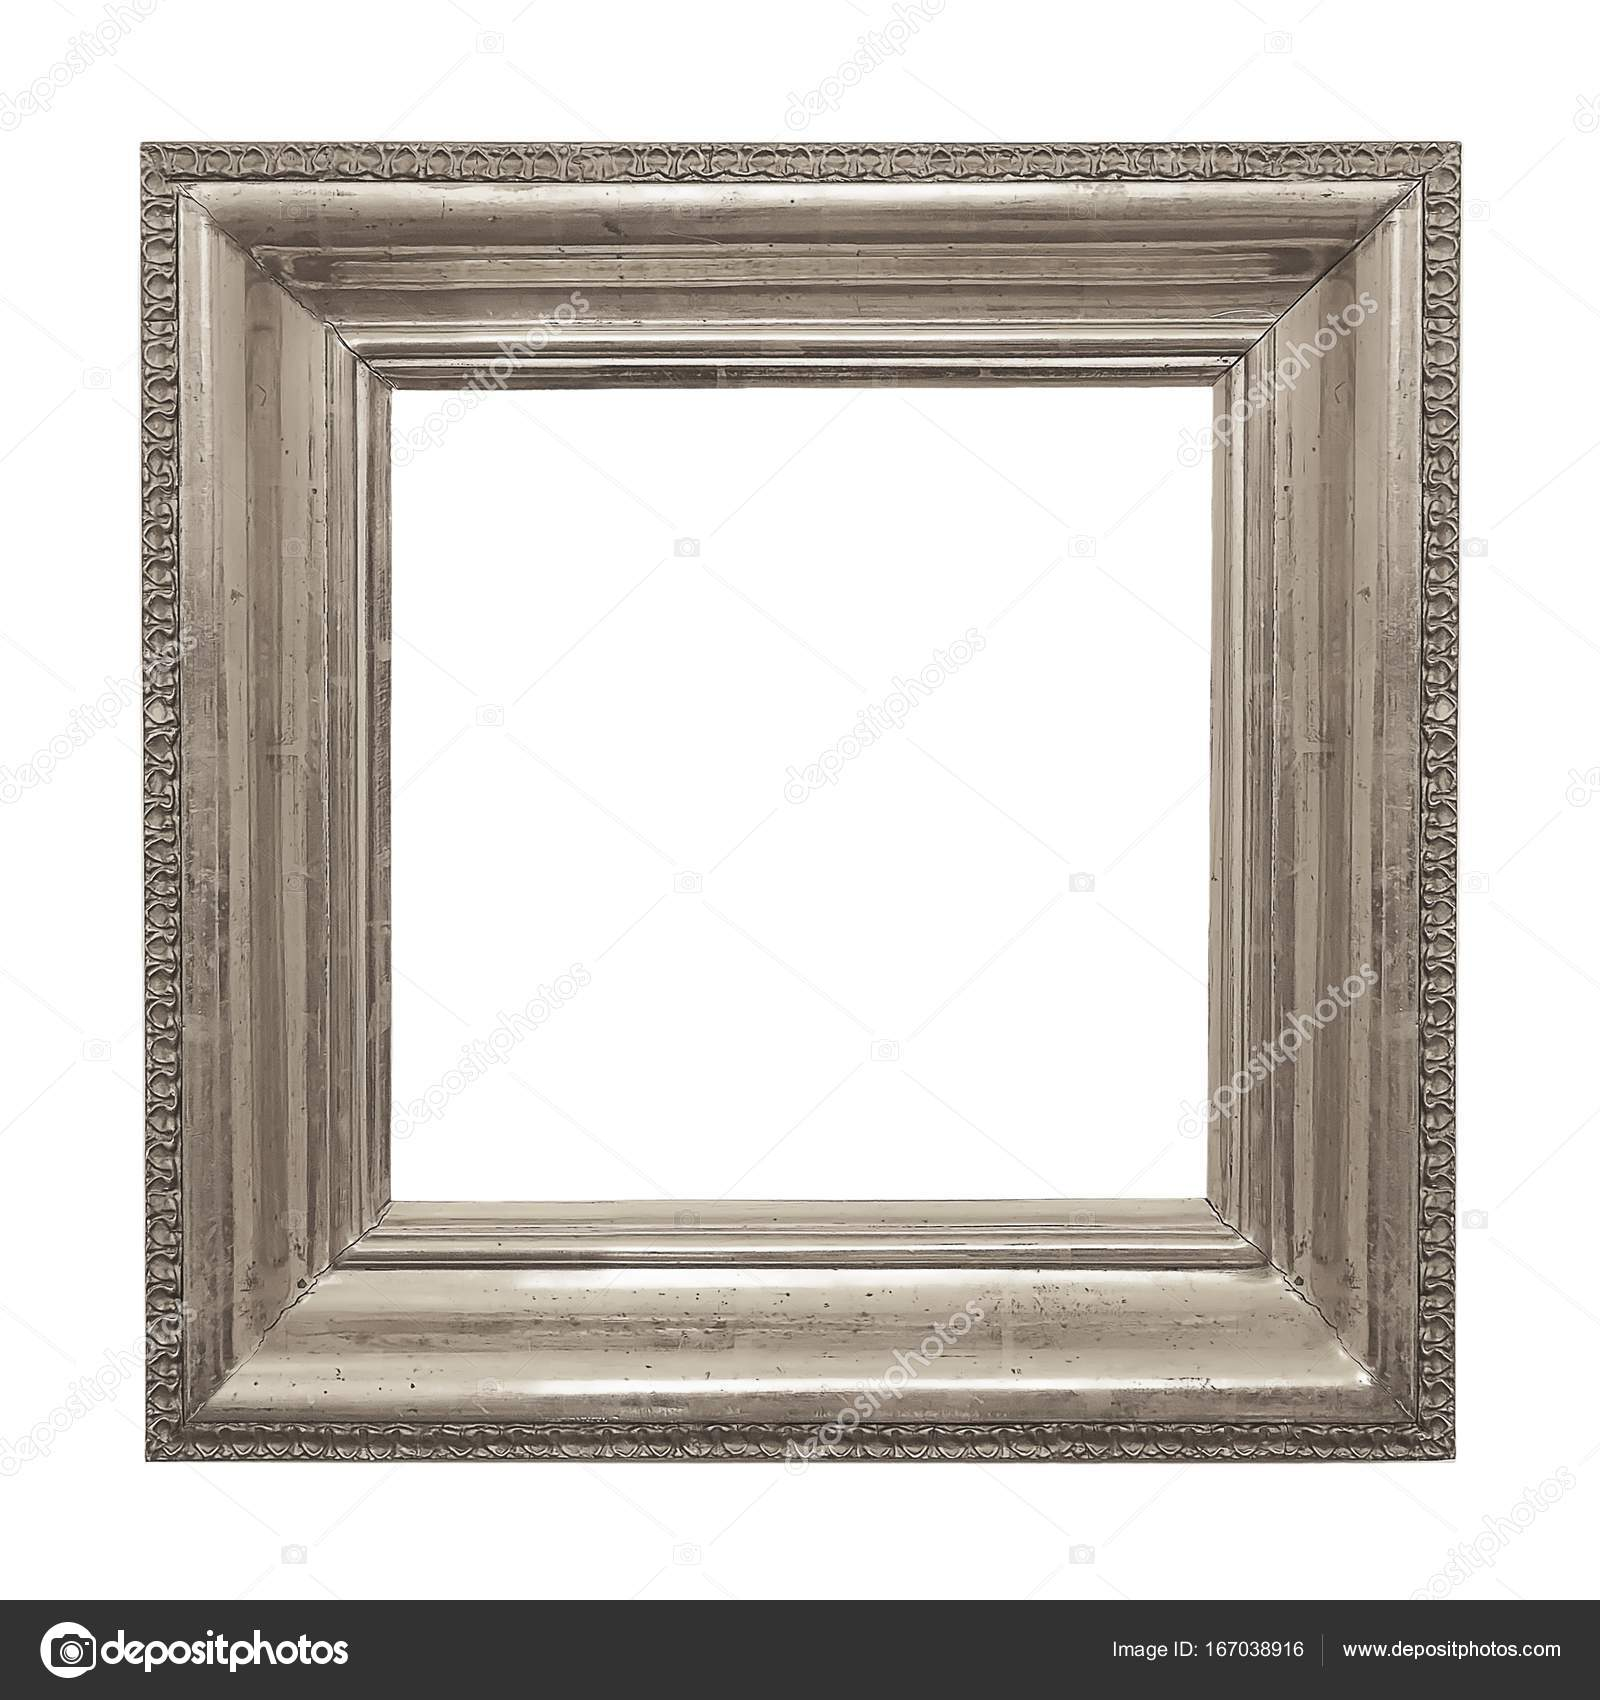 Marco de plata para cuadros, espejos o fotos — Foto de stock ...